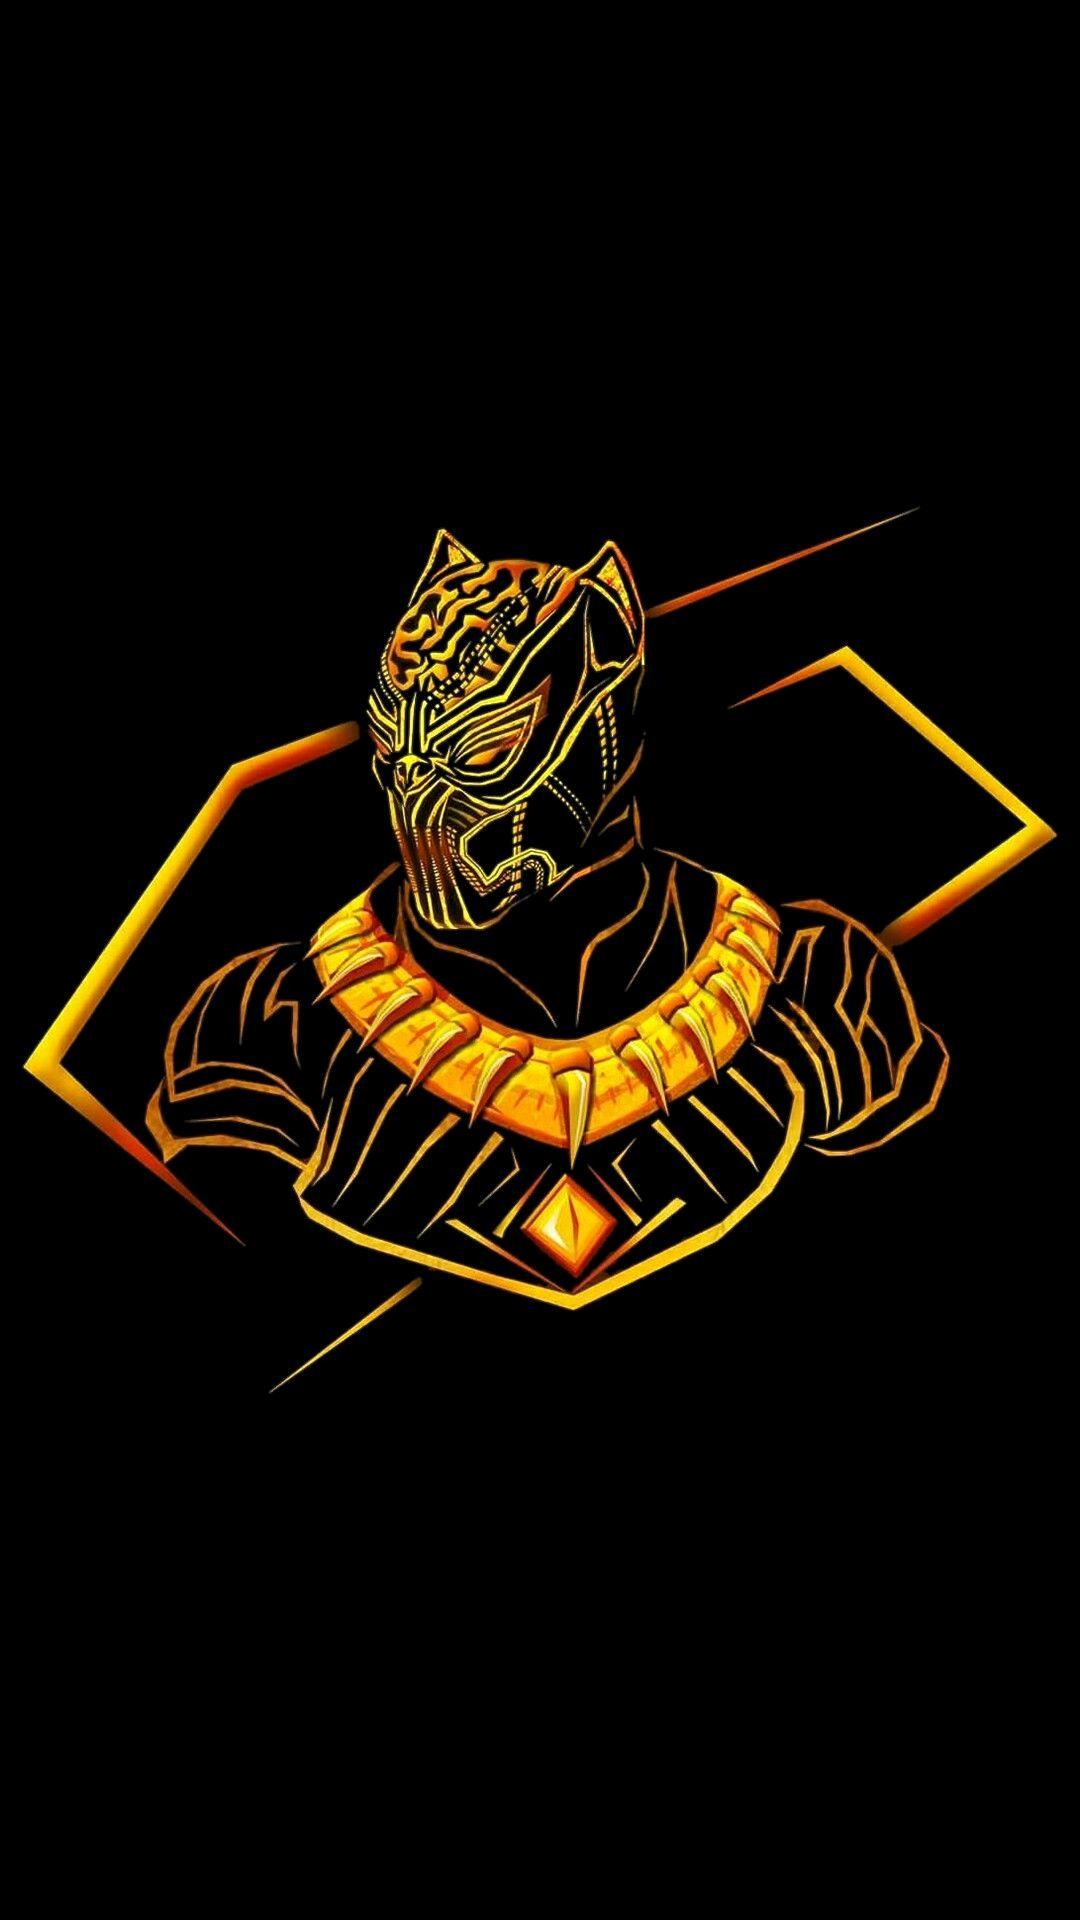 Black Panther Neon Glow Avengers Iphone Wallpaper